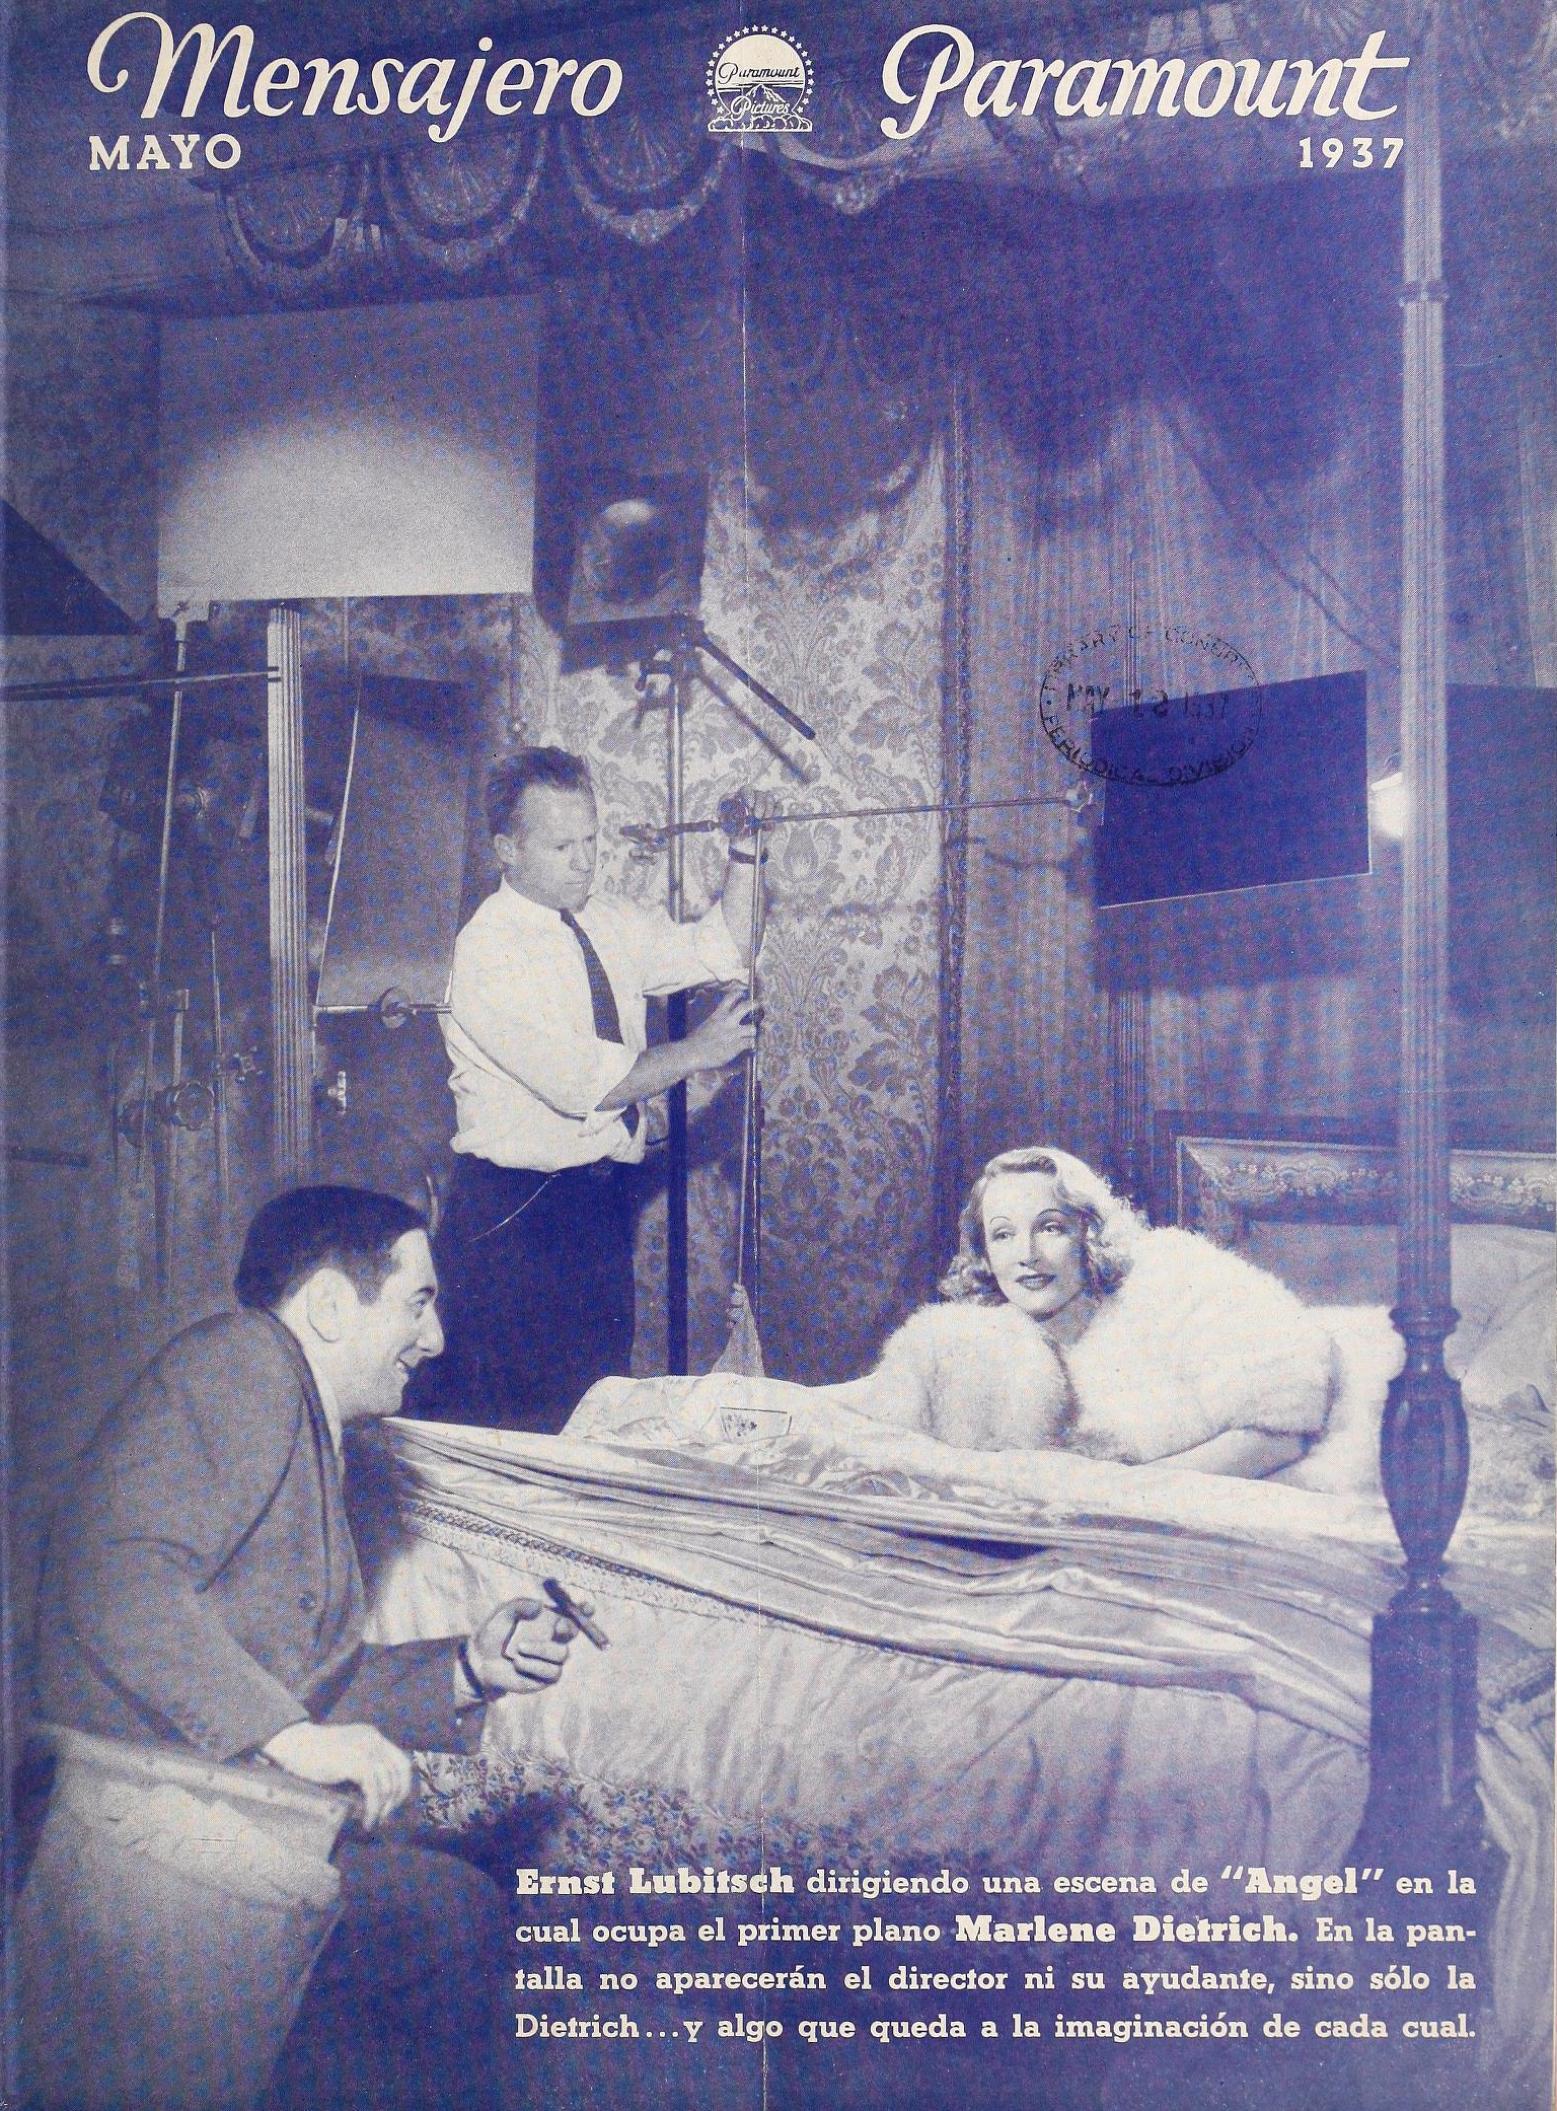 mensajero paramount may 1937 cover large